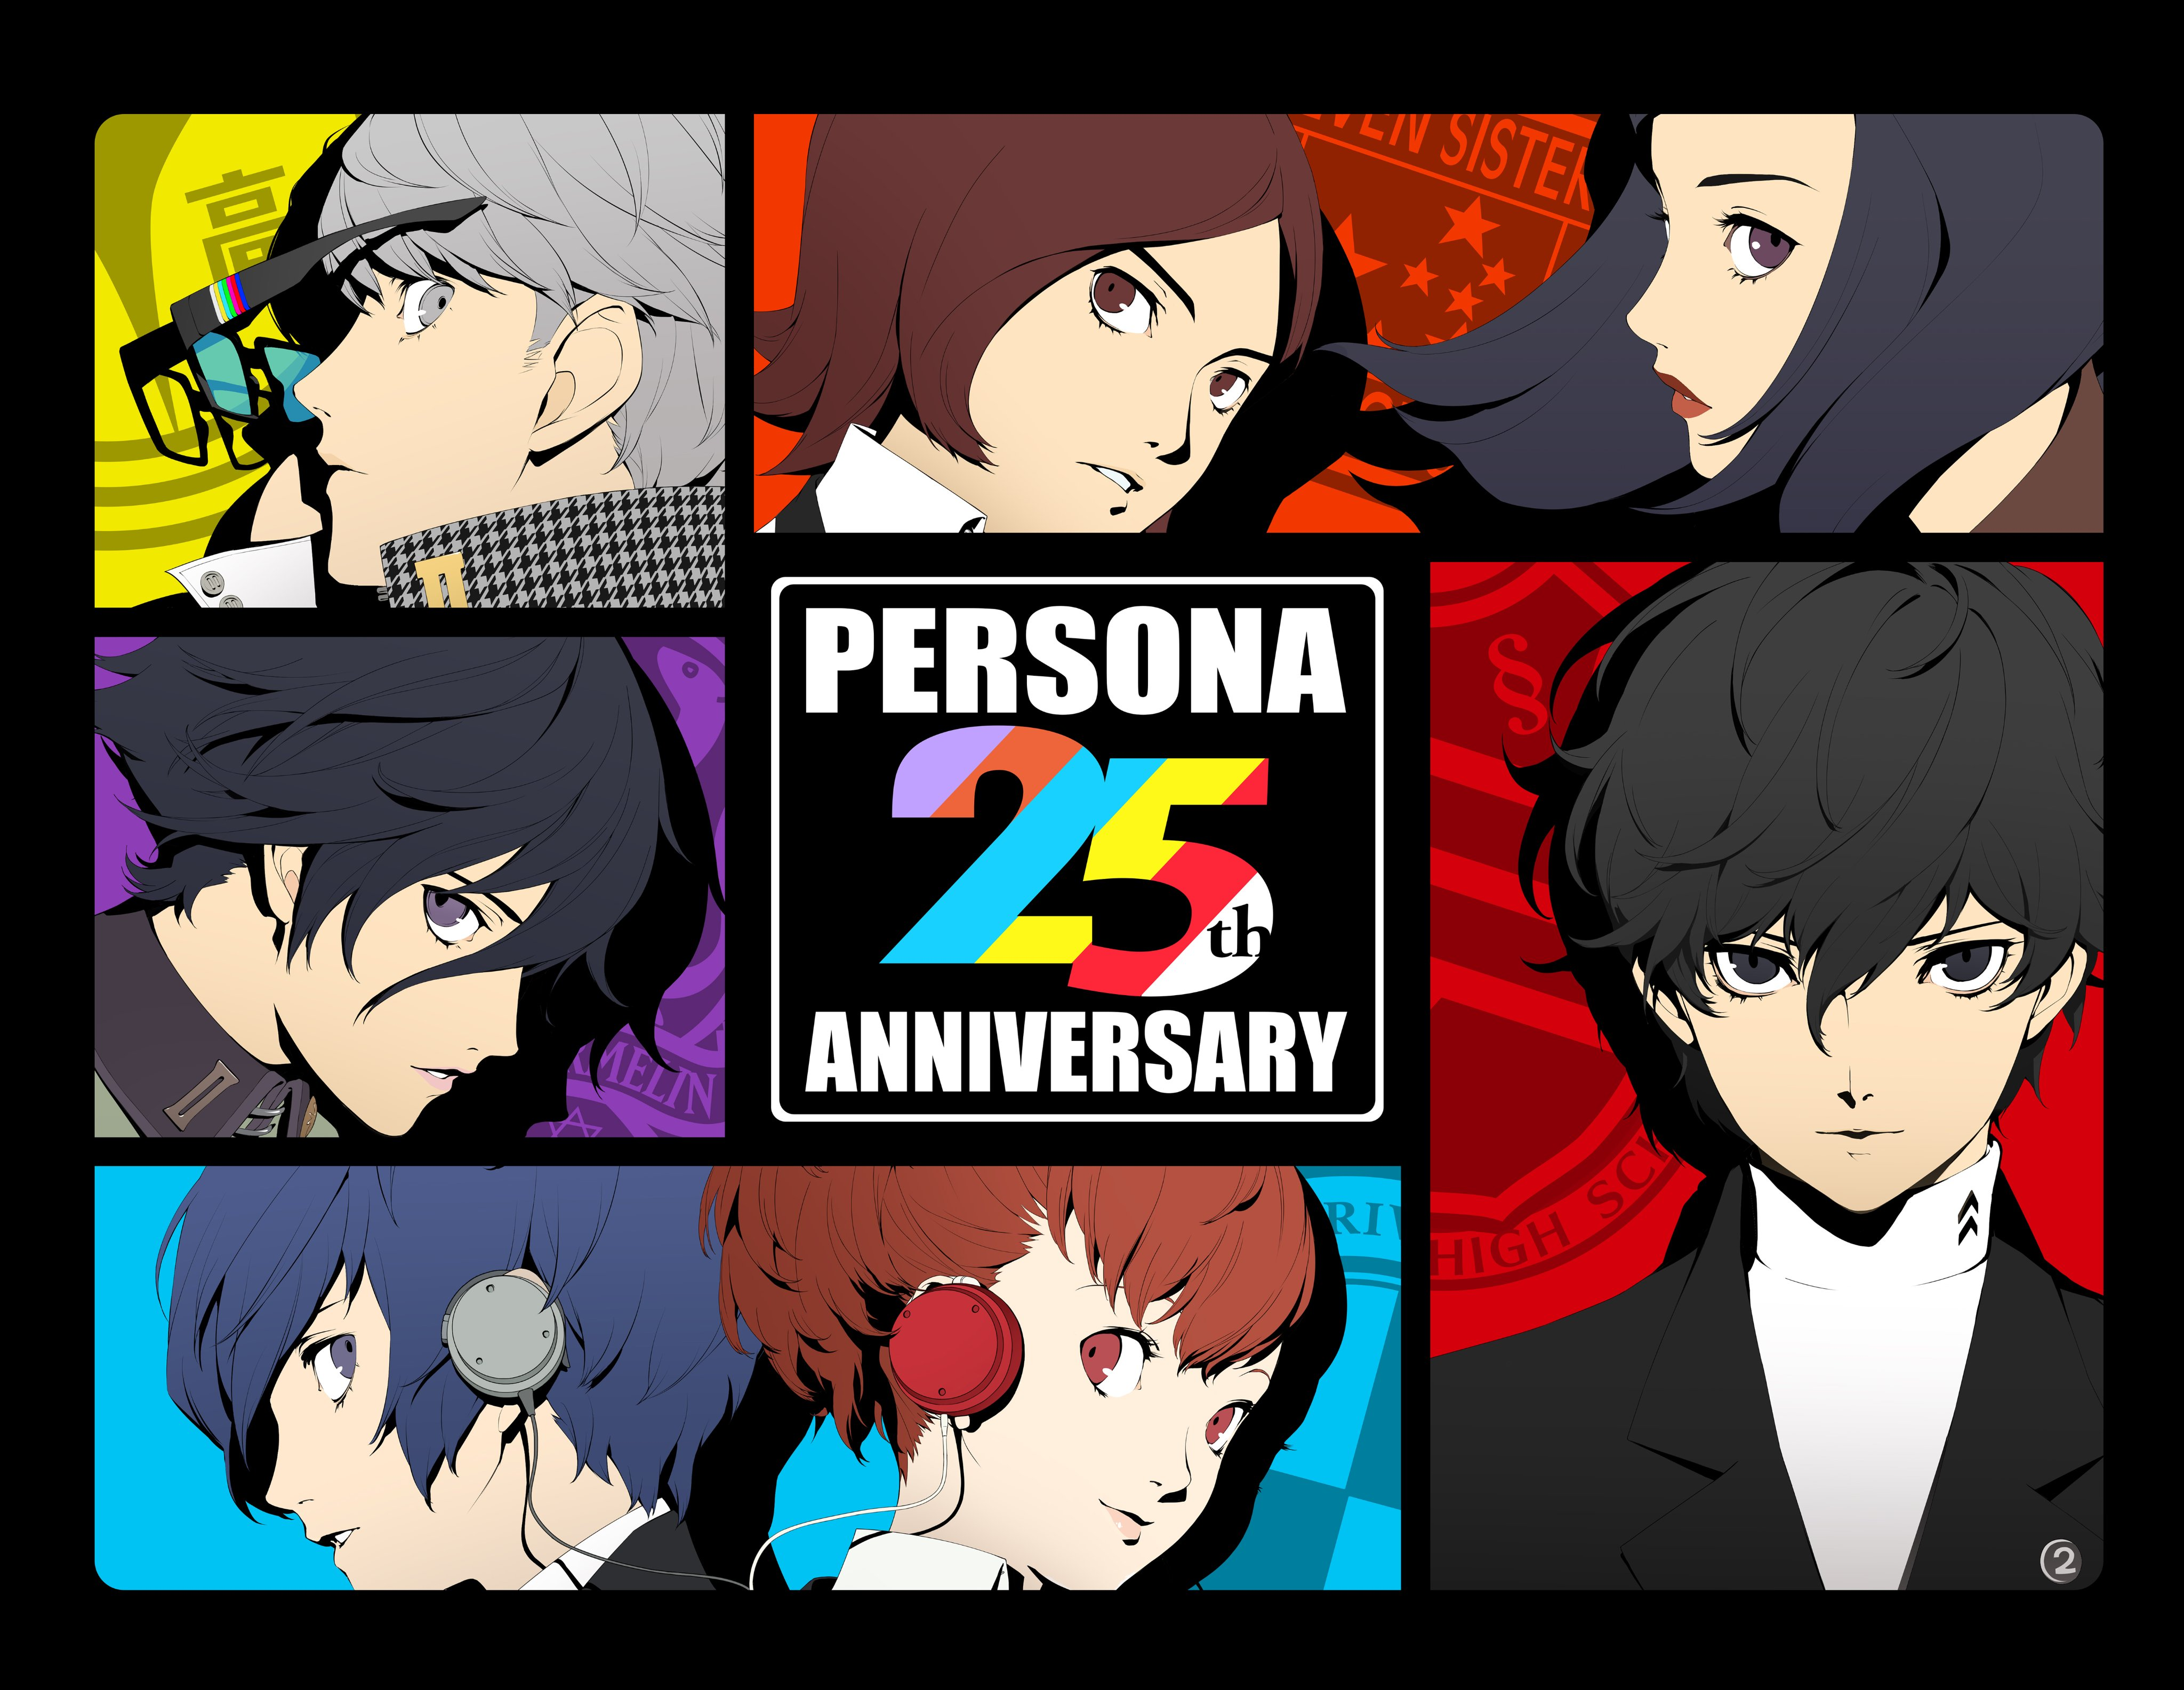 Personaje visual del 25 aniversario